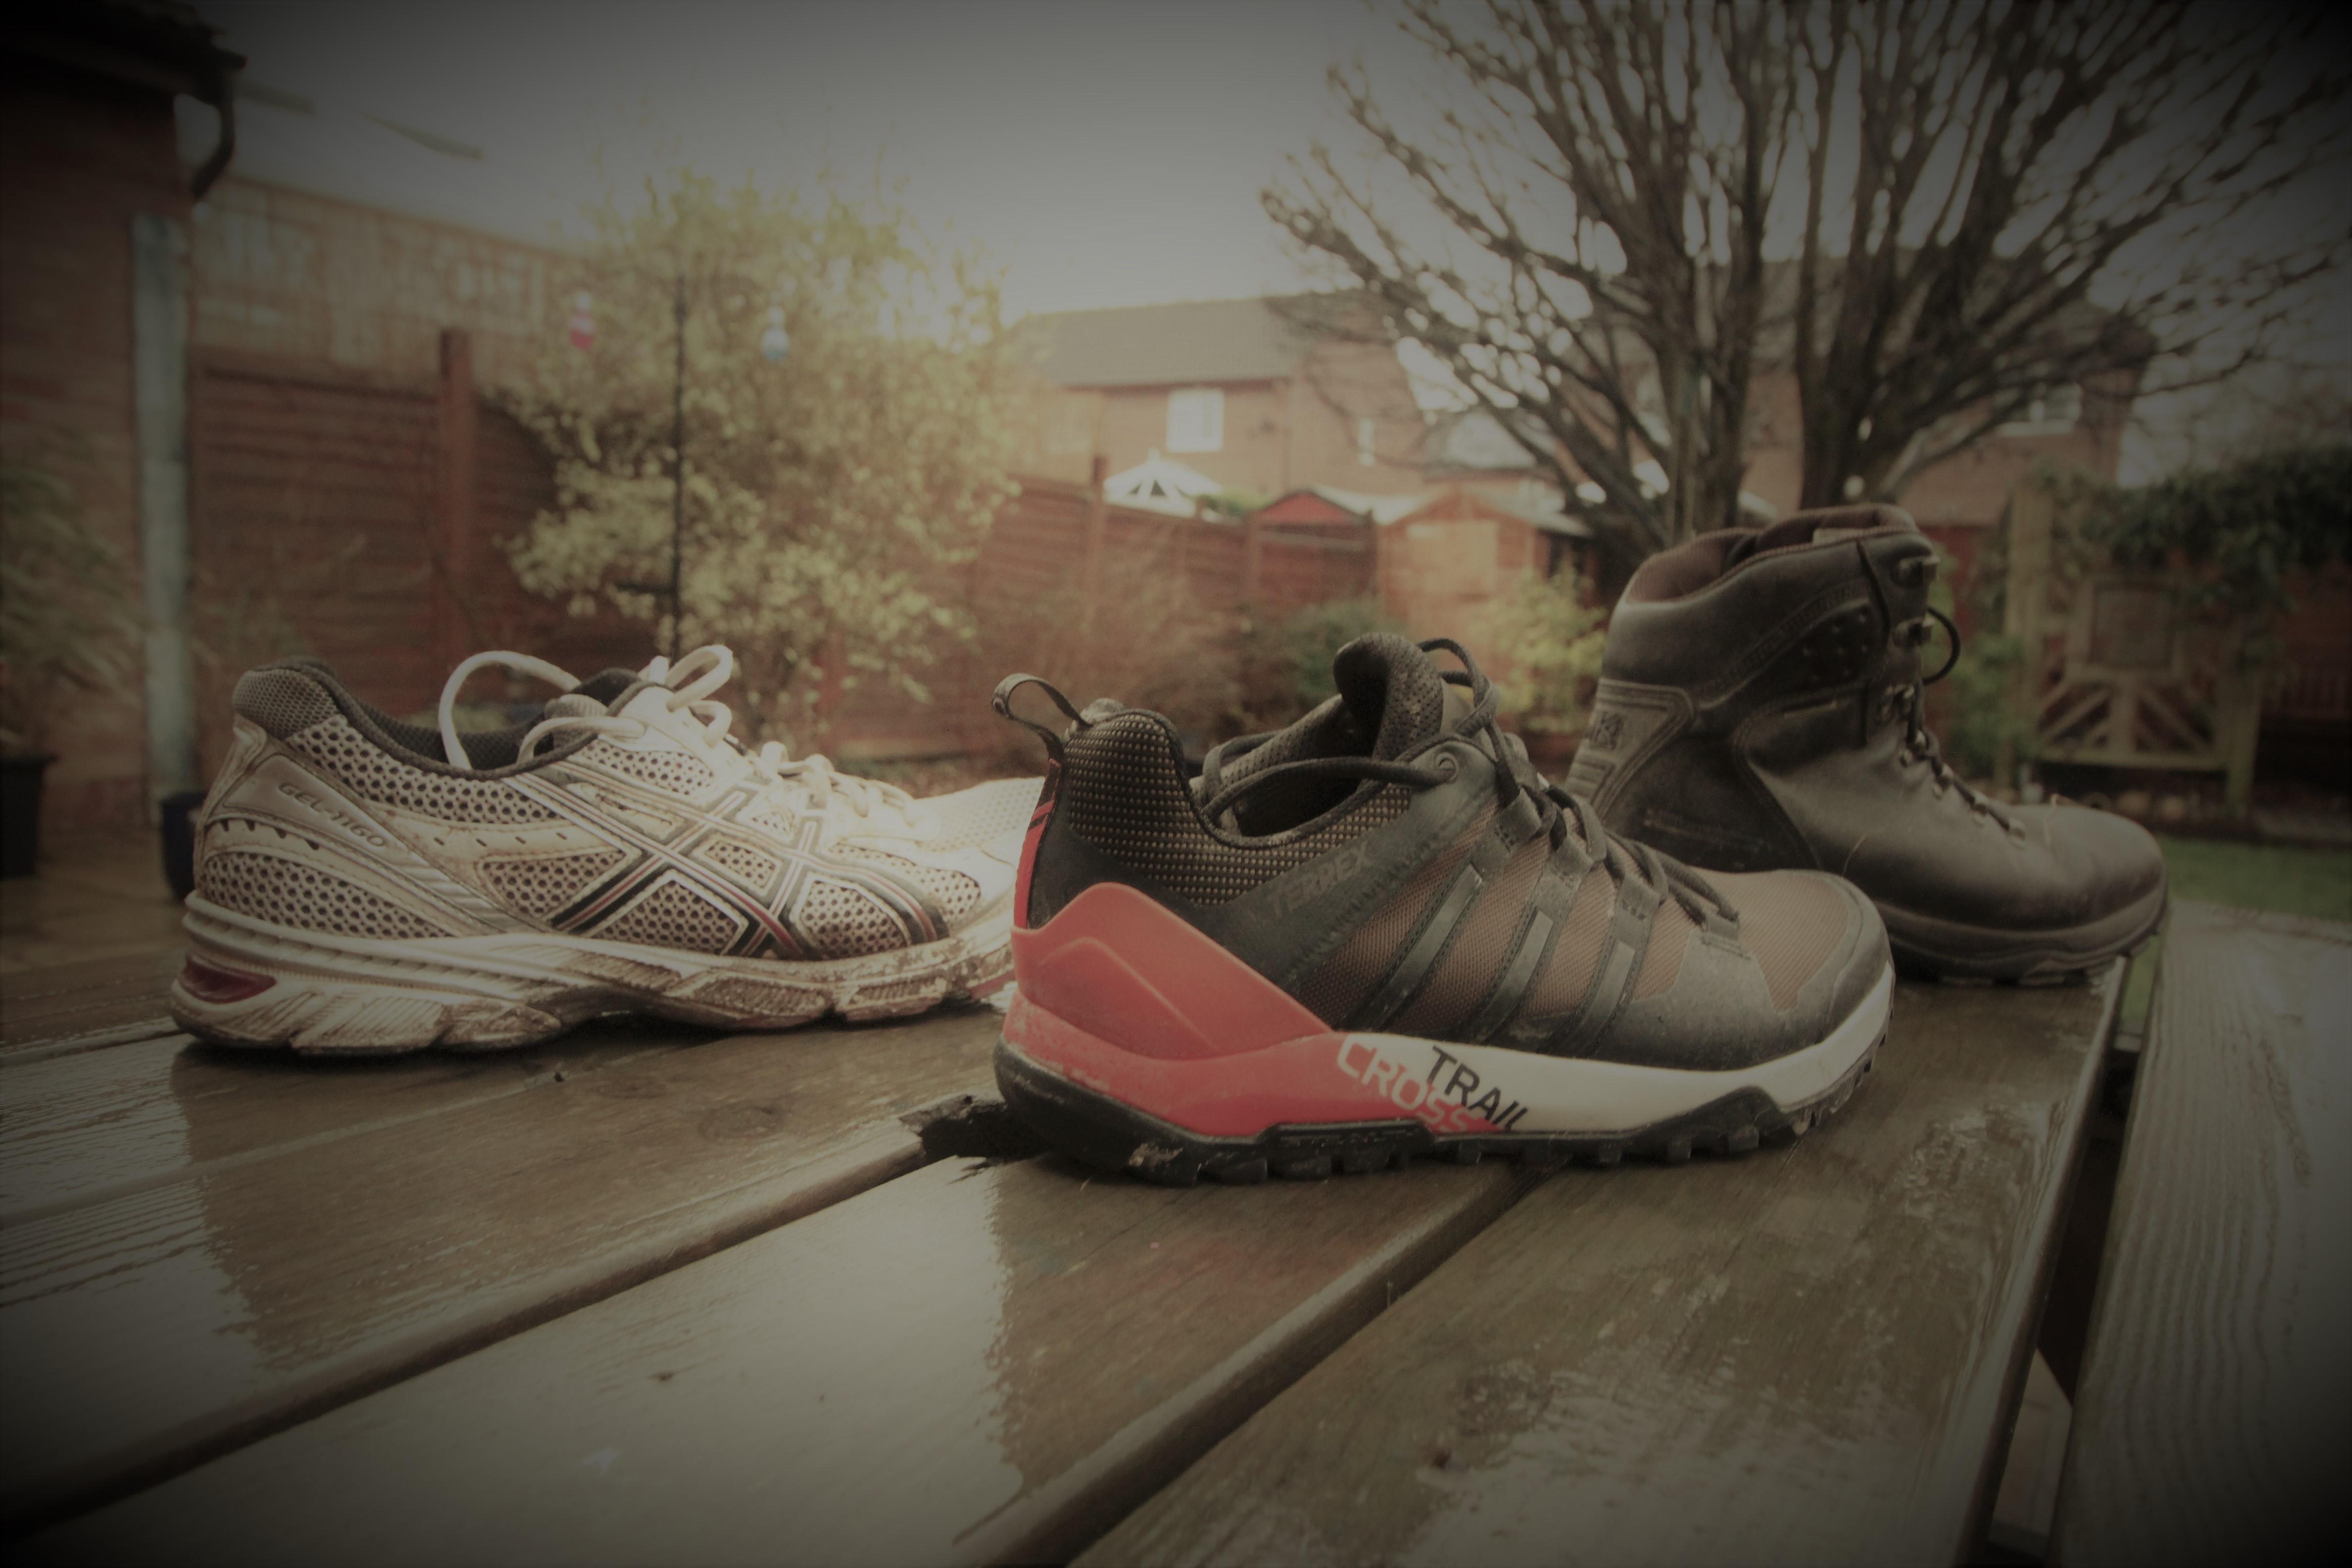 Adidas TERREX Trail Cross MTB Shoes